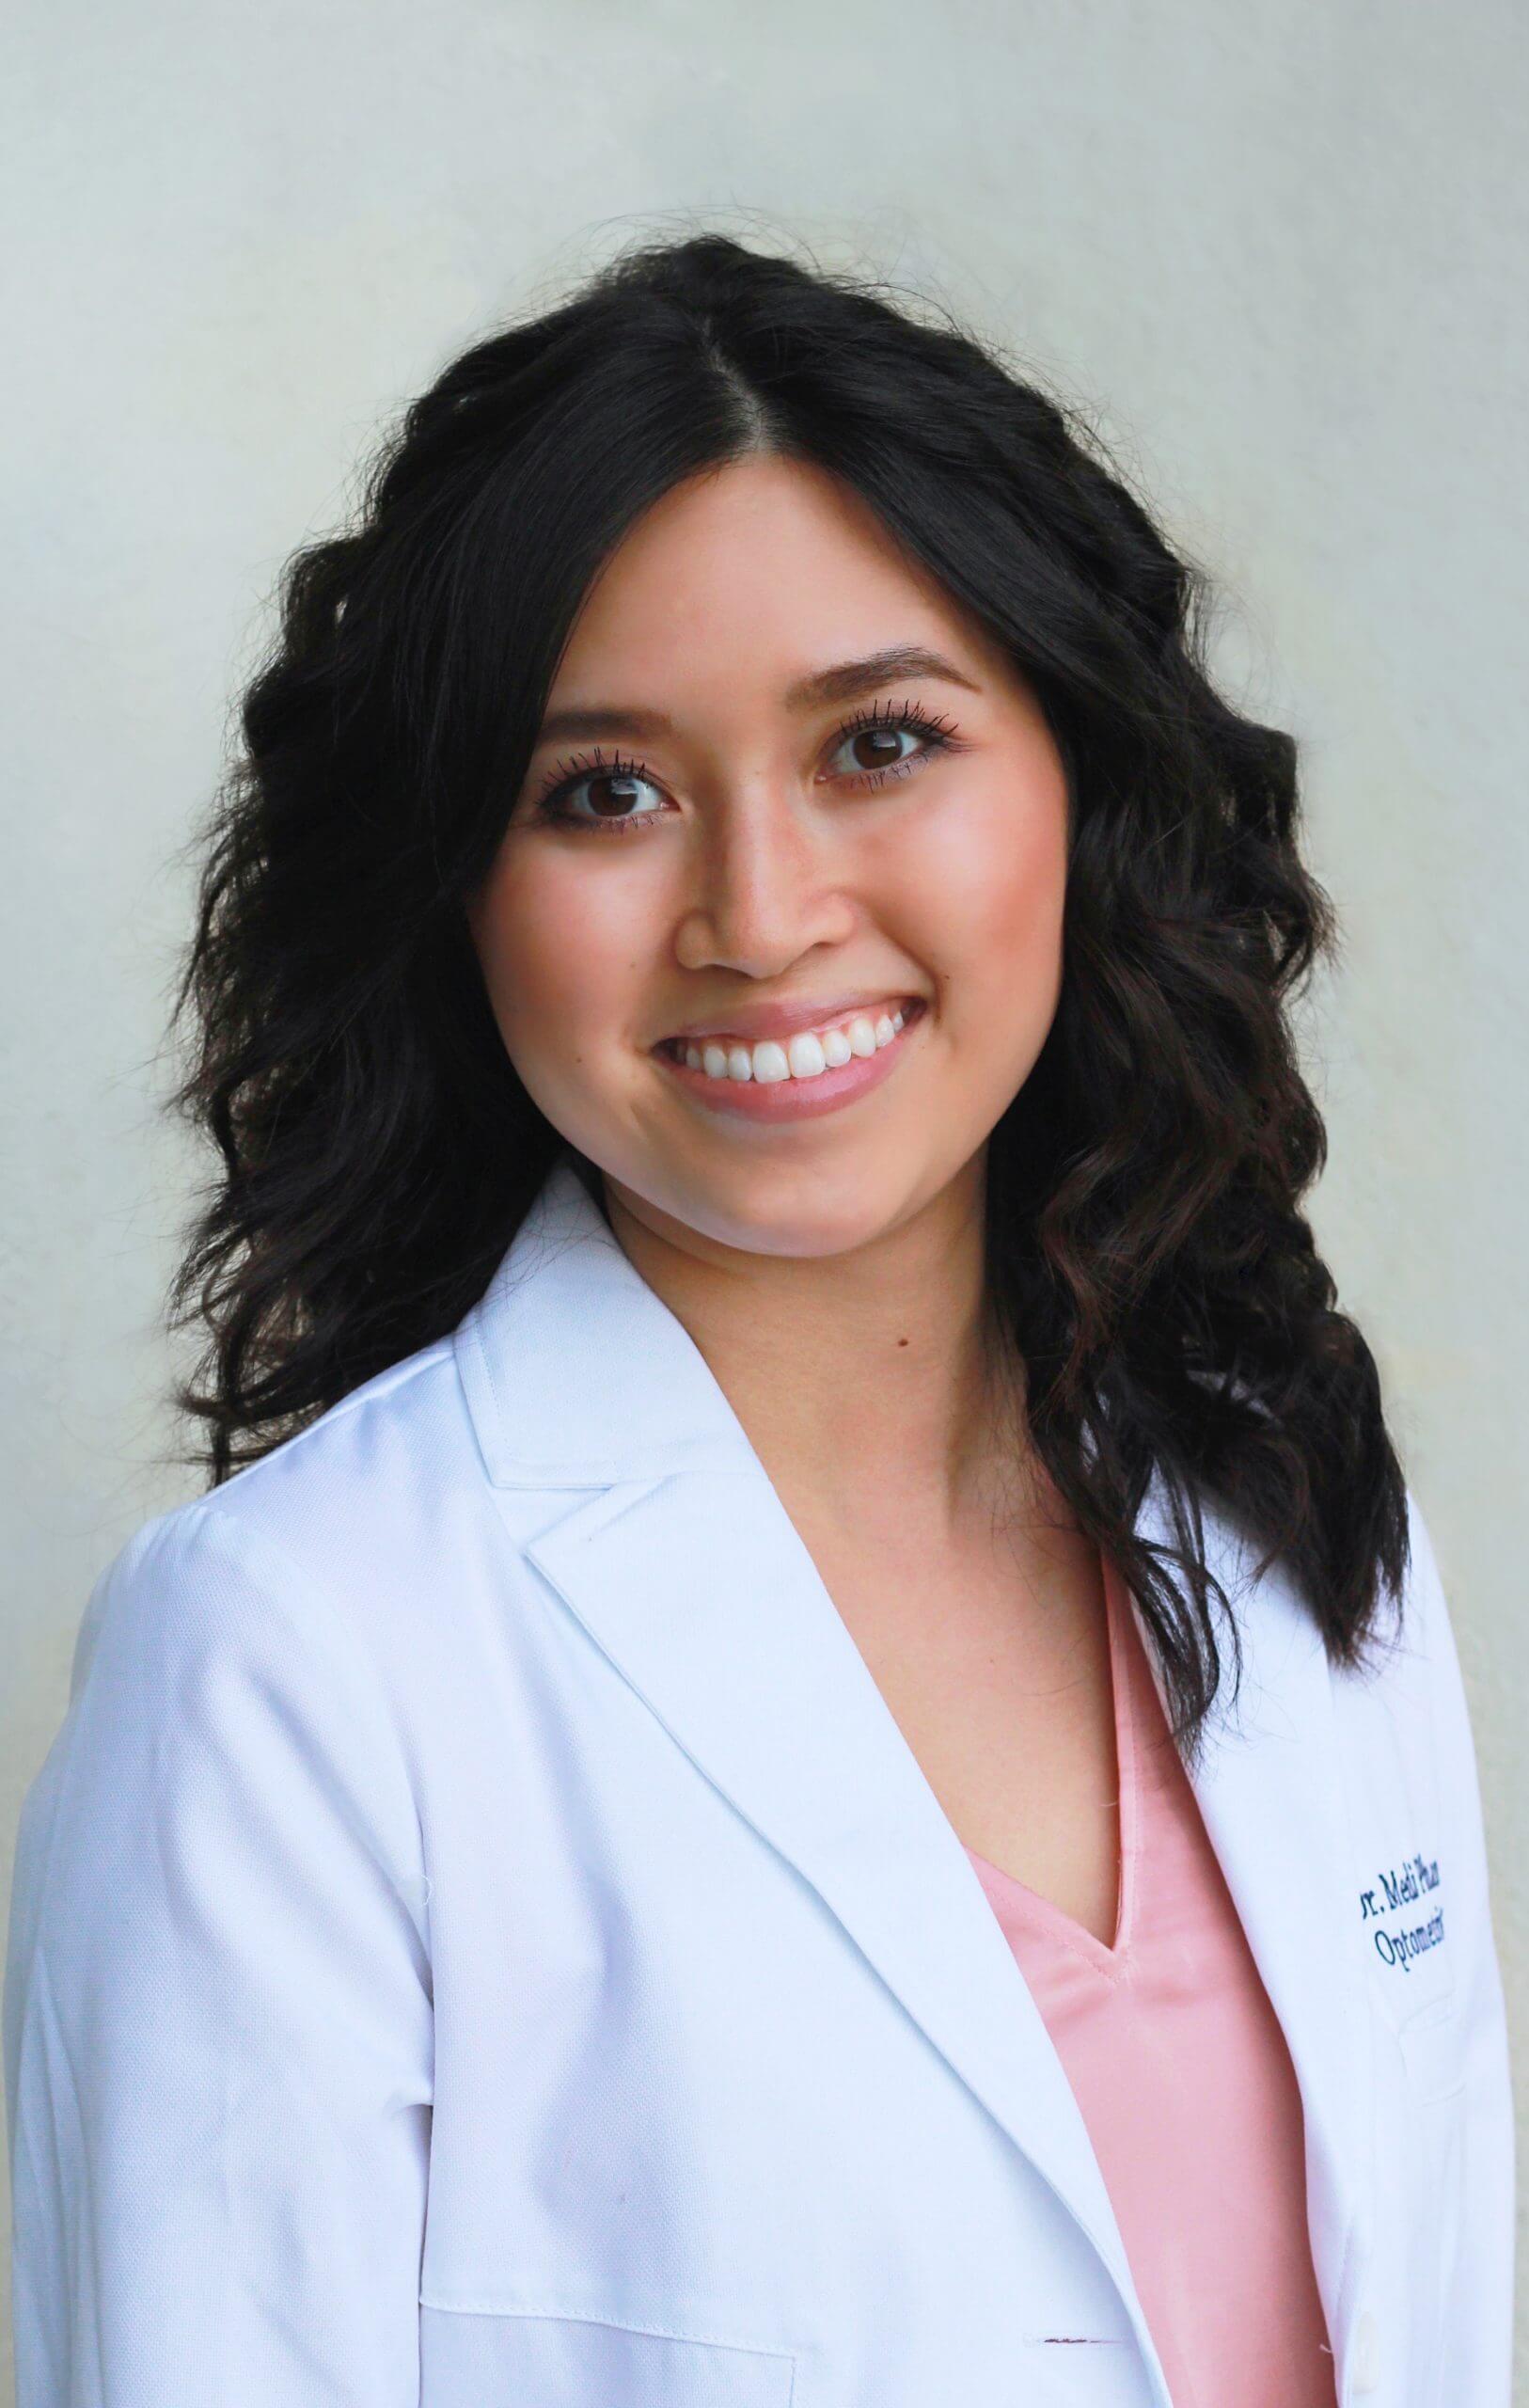 Dr.-Phan-headshot-scaled